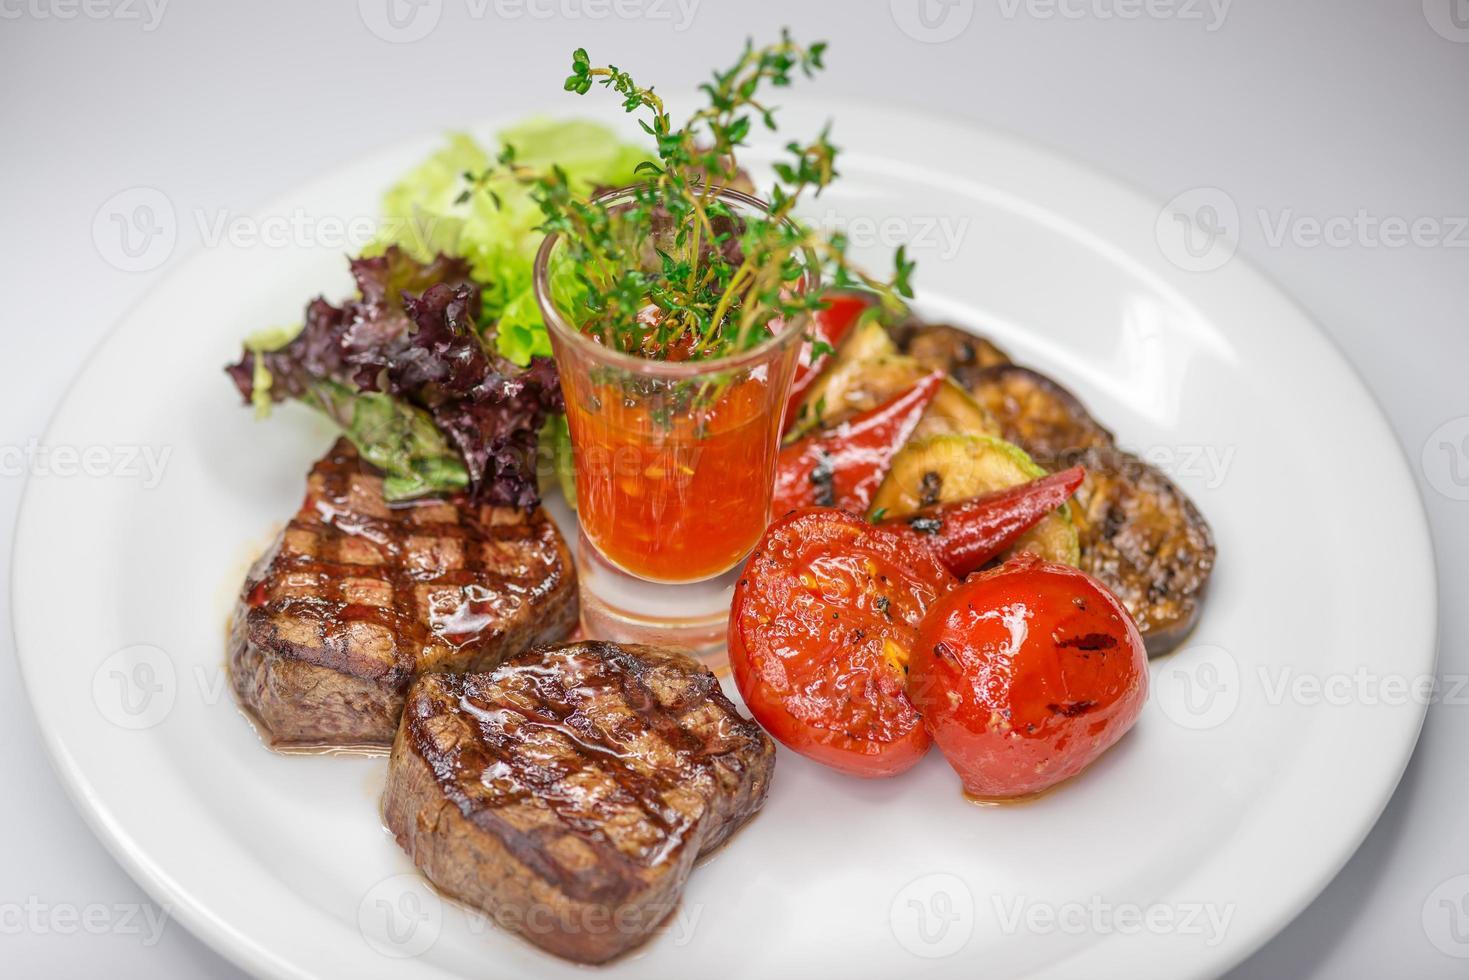 bistecca e verdure foto